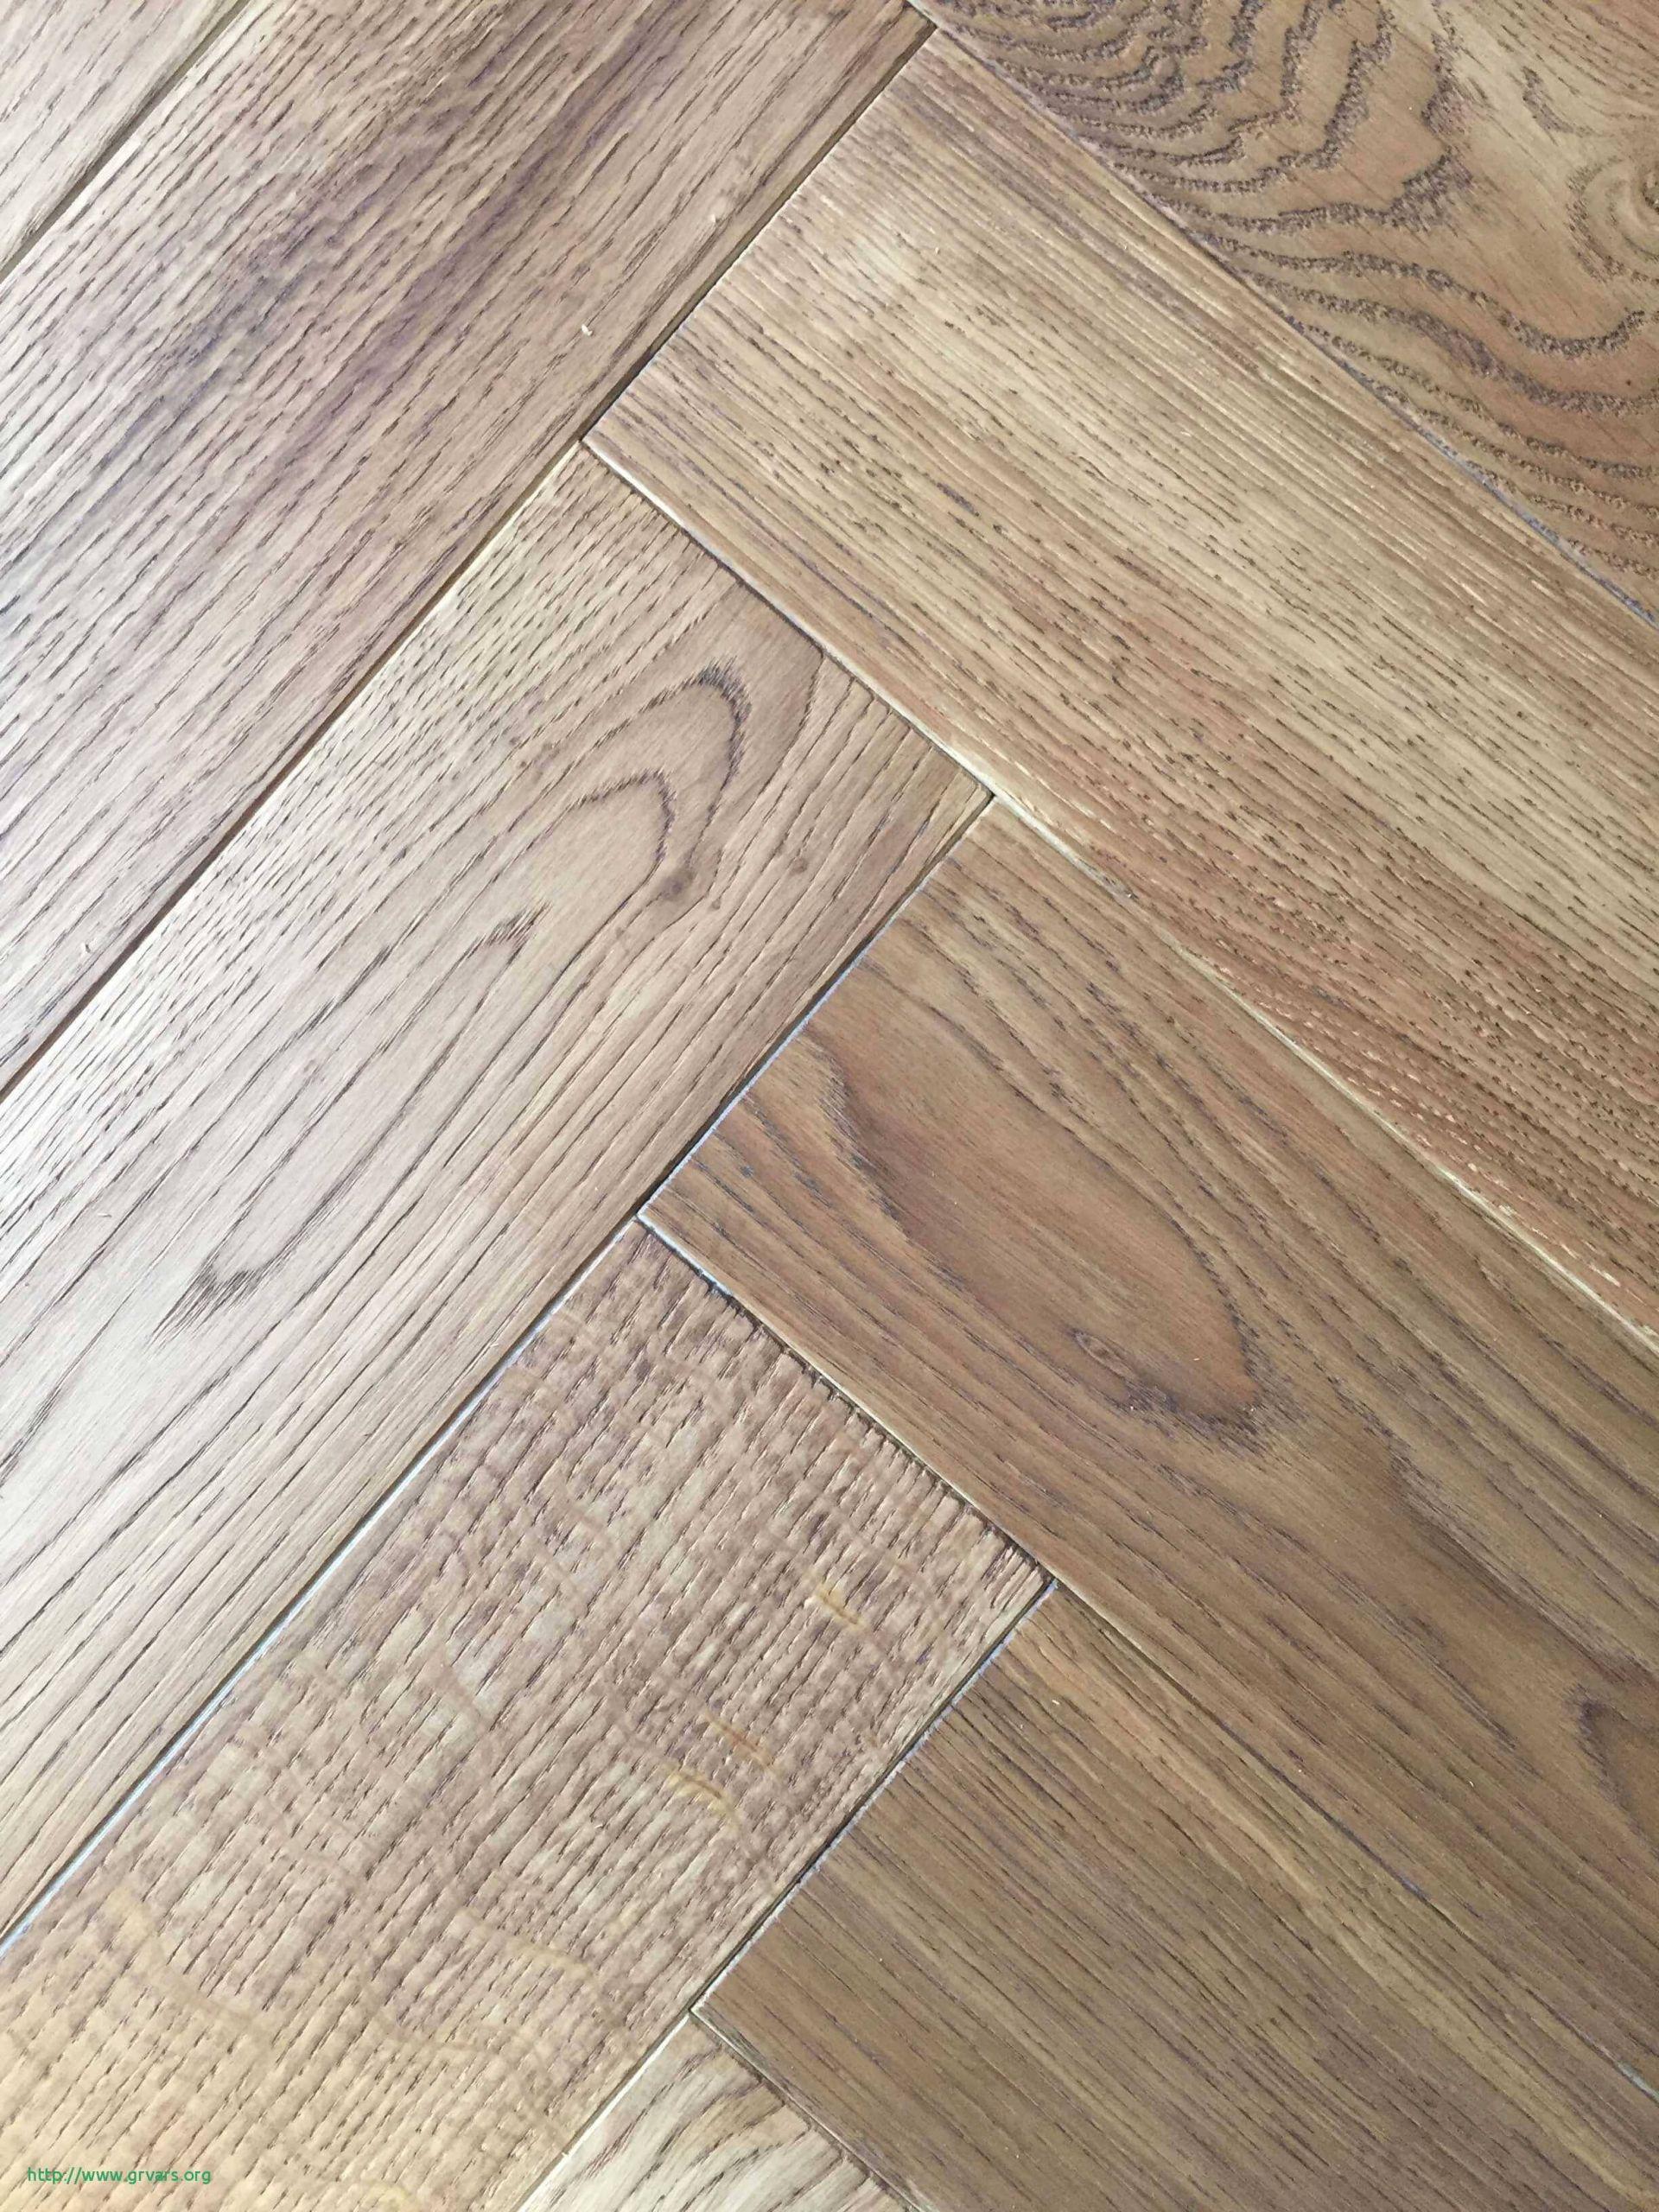 decorative hardwood floor borders of 23 inspirant prefabricated wood floors ideas blog inside engineered wood flooring new decorating an open floor plan living room awesome design plan 0d